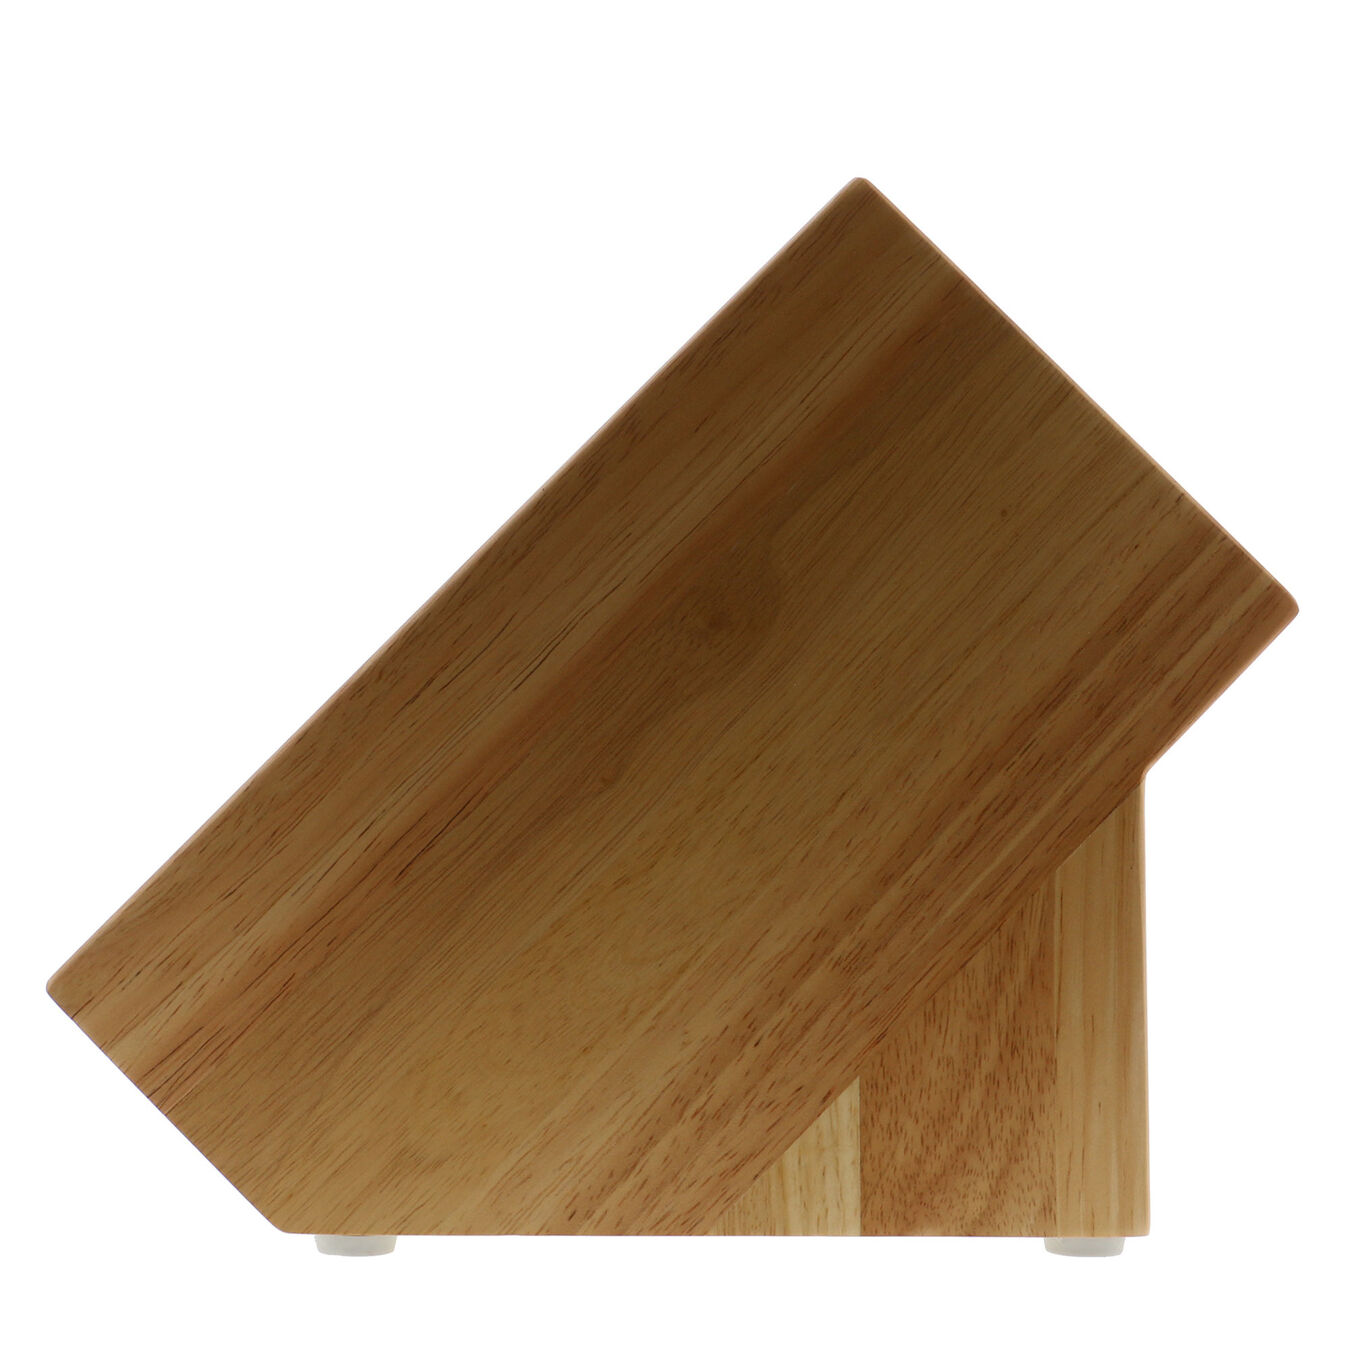 Ash, Knife block empty,,large 4